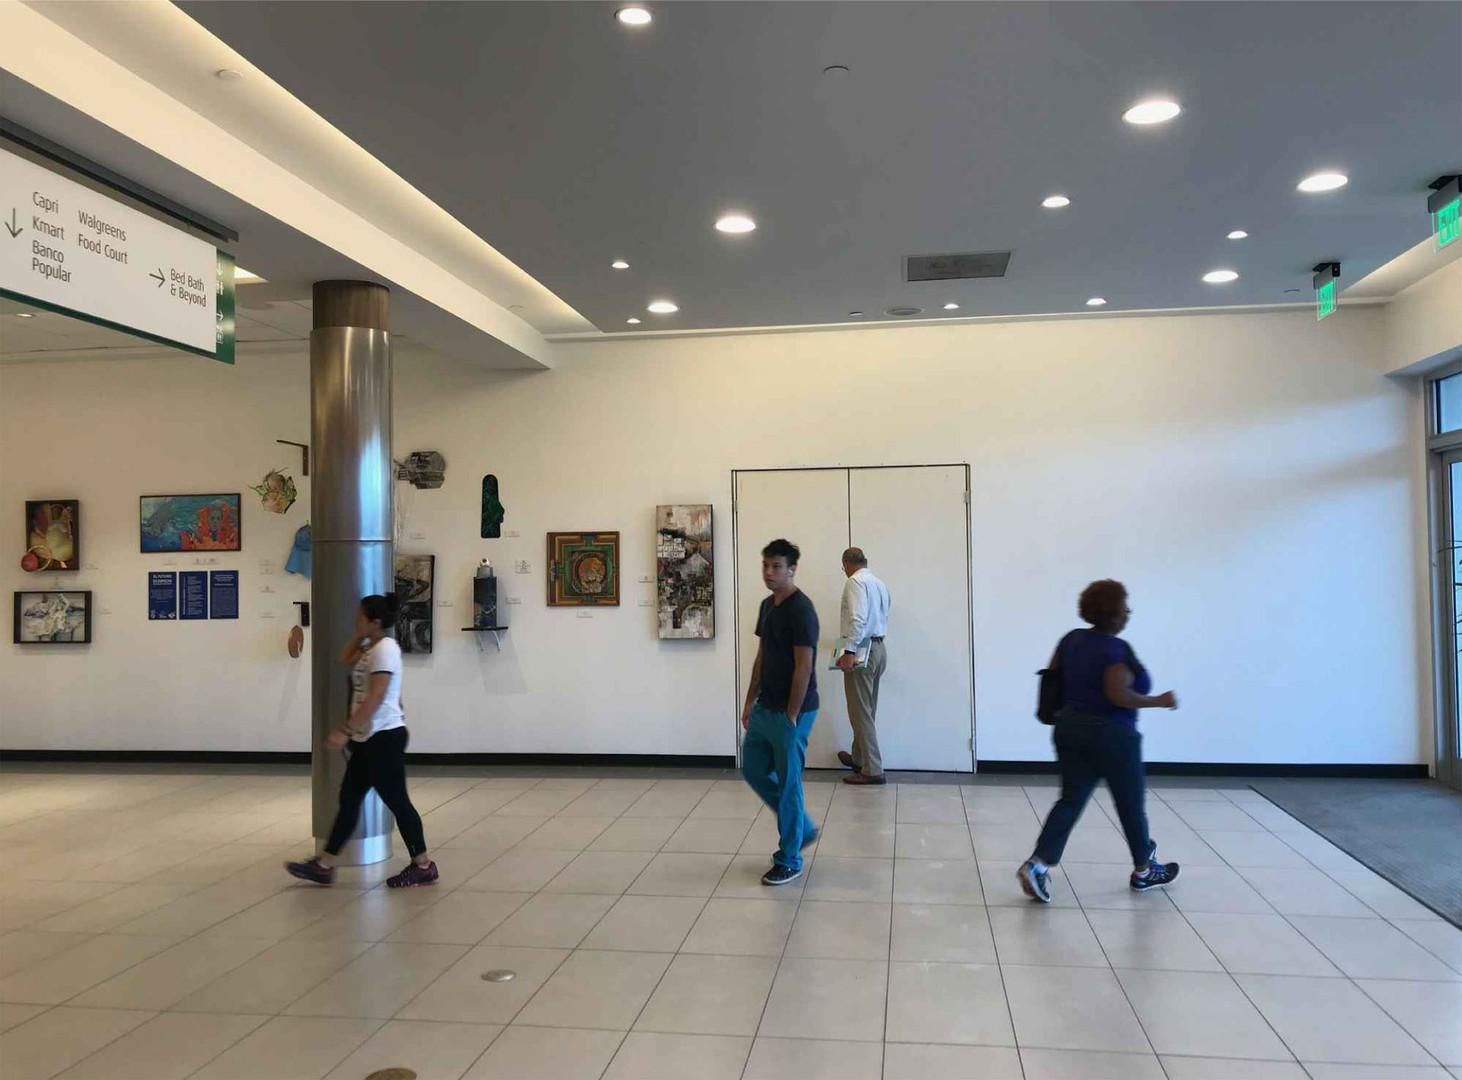 Mall adjacent corridor